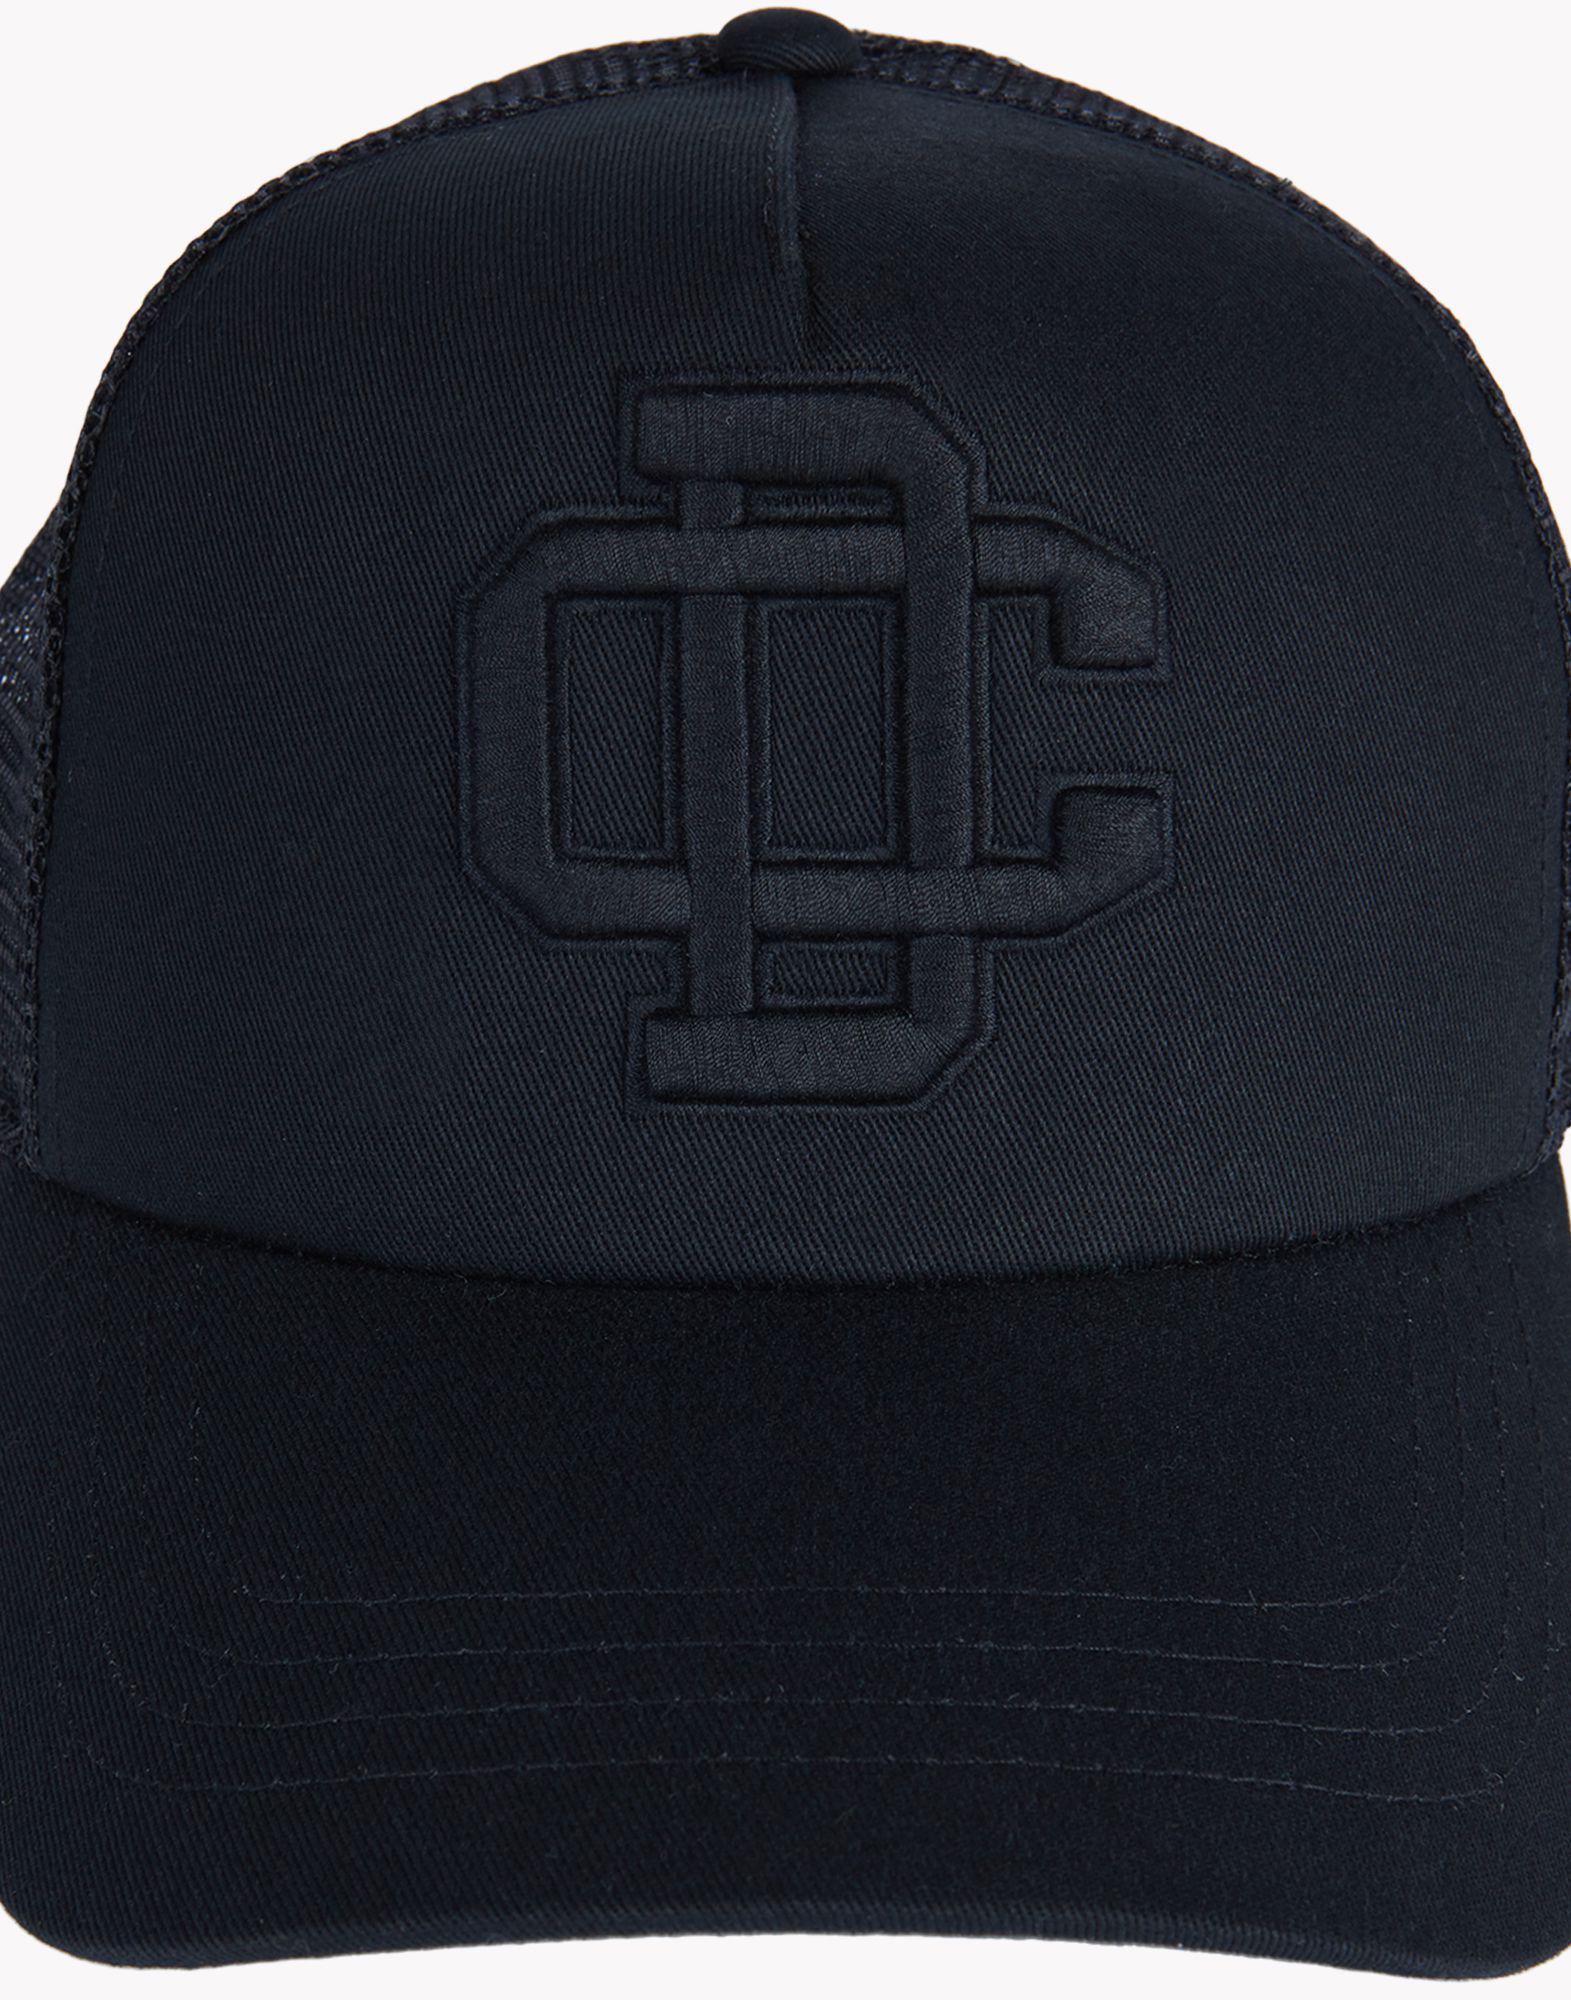 Lyst - DSquared² DC Baseball Cap in Black for Men 6887a2f8d28